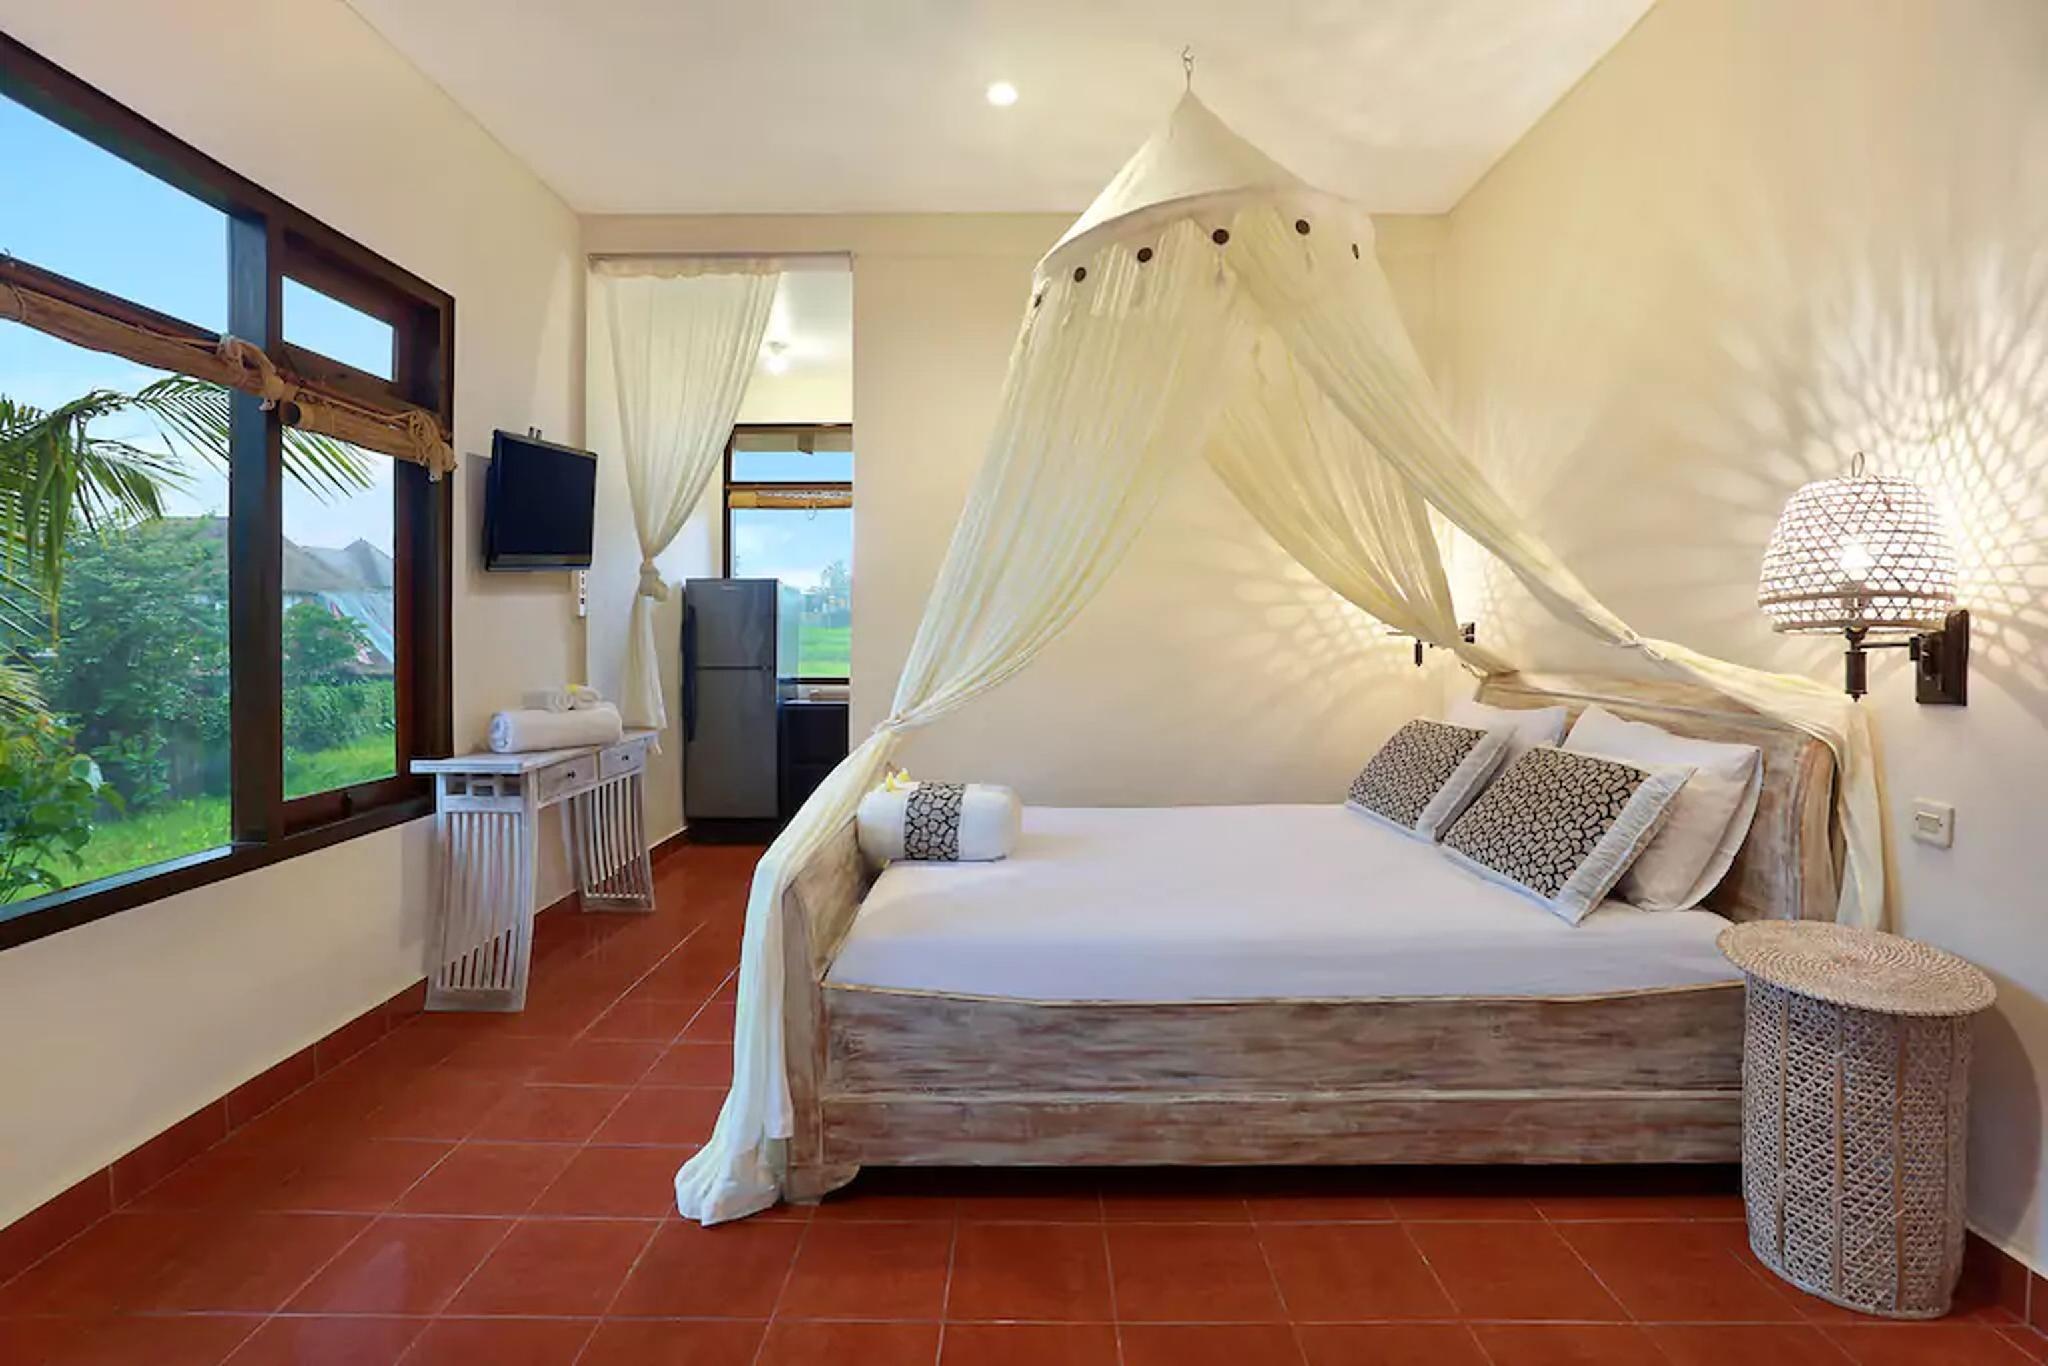 Danaya's cottage room 2